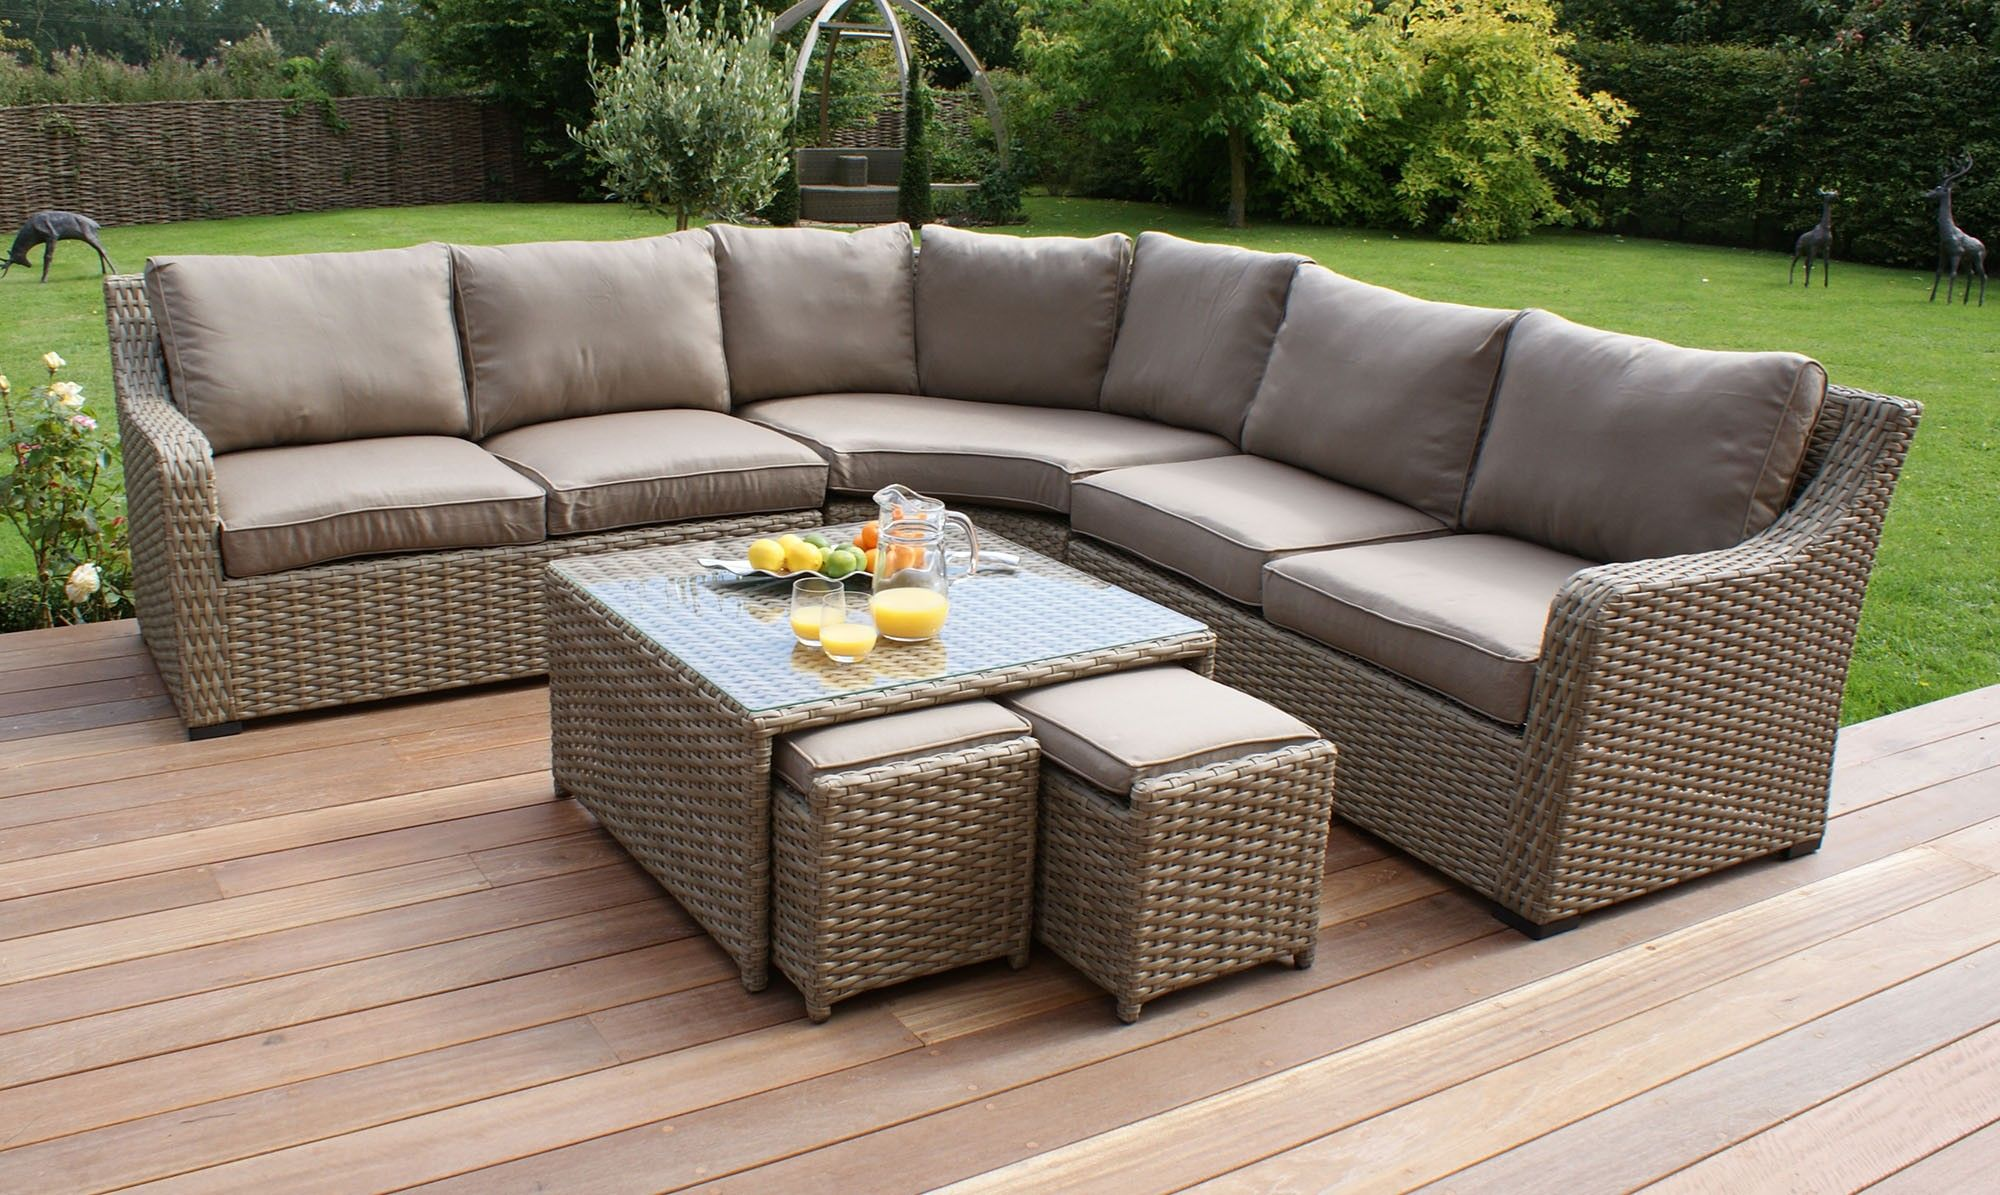 shop for beautiful natural rattan garden furniture at fishpools - Garden Furniture Corner Sofa